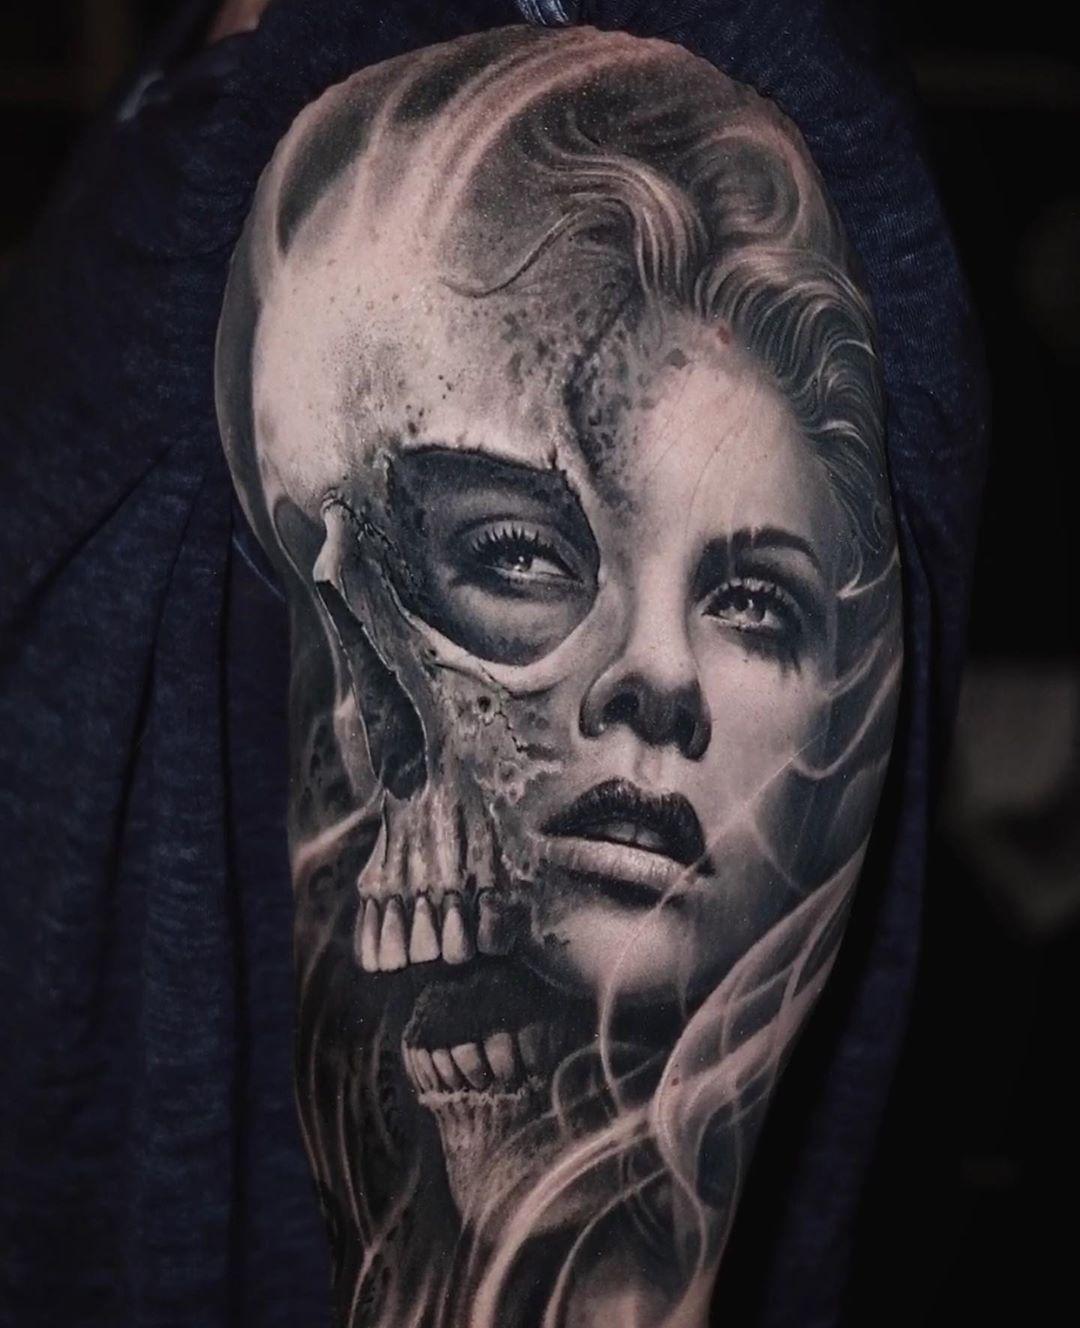 👩🏻 🙏🏻⚡👏 Woman & Skull Artist: @joseecd Country: US ——————————————————————— ⚜️FOLLOW⚜️ @skingiants for daily tattoos! Sharing only the best tattoos Artists on instagram —————————————————————— #realismtattoo #blackandgreytattoo #skingiants #tattooist #tattoolove #tattooed #tattoosleeve #tattoodesign #tattoolover #tattooworld #tattoosofinstagram #tattoolovers #tattooarm #inked #tat #tats